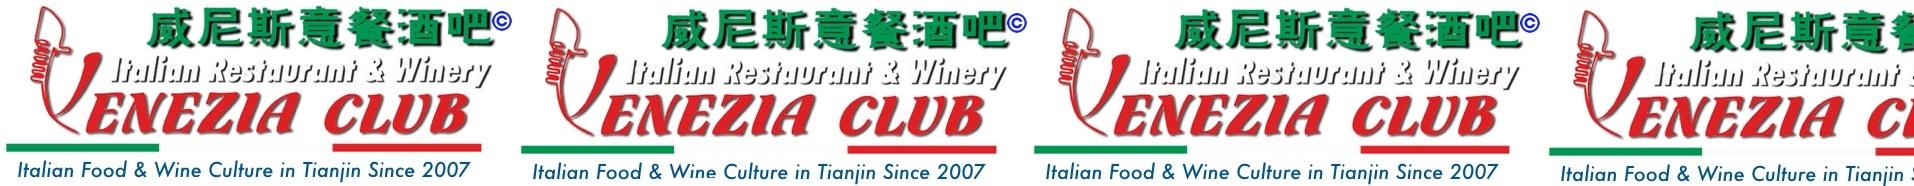 venezia club